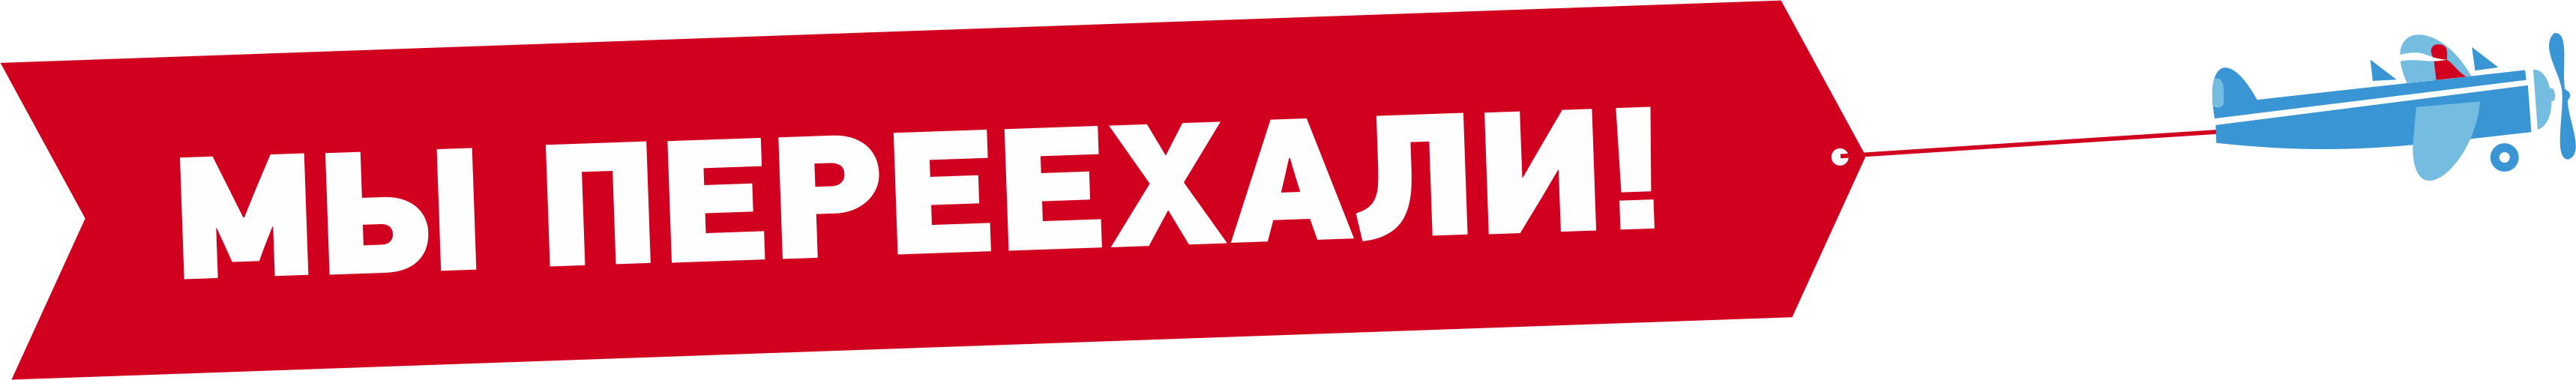 http://sd.uploads.ru/6Yyhr.png